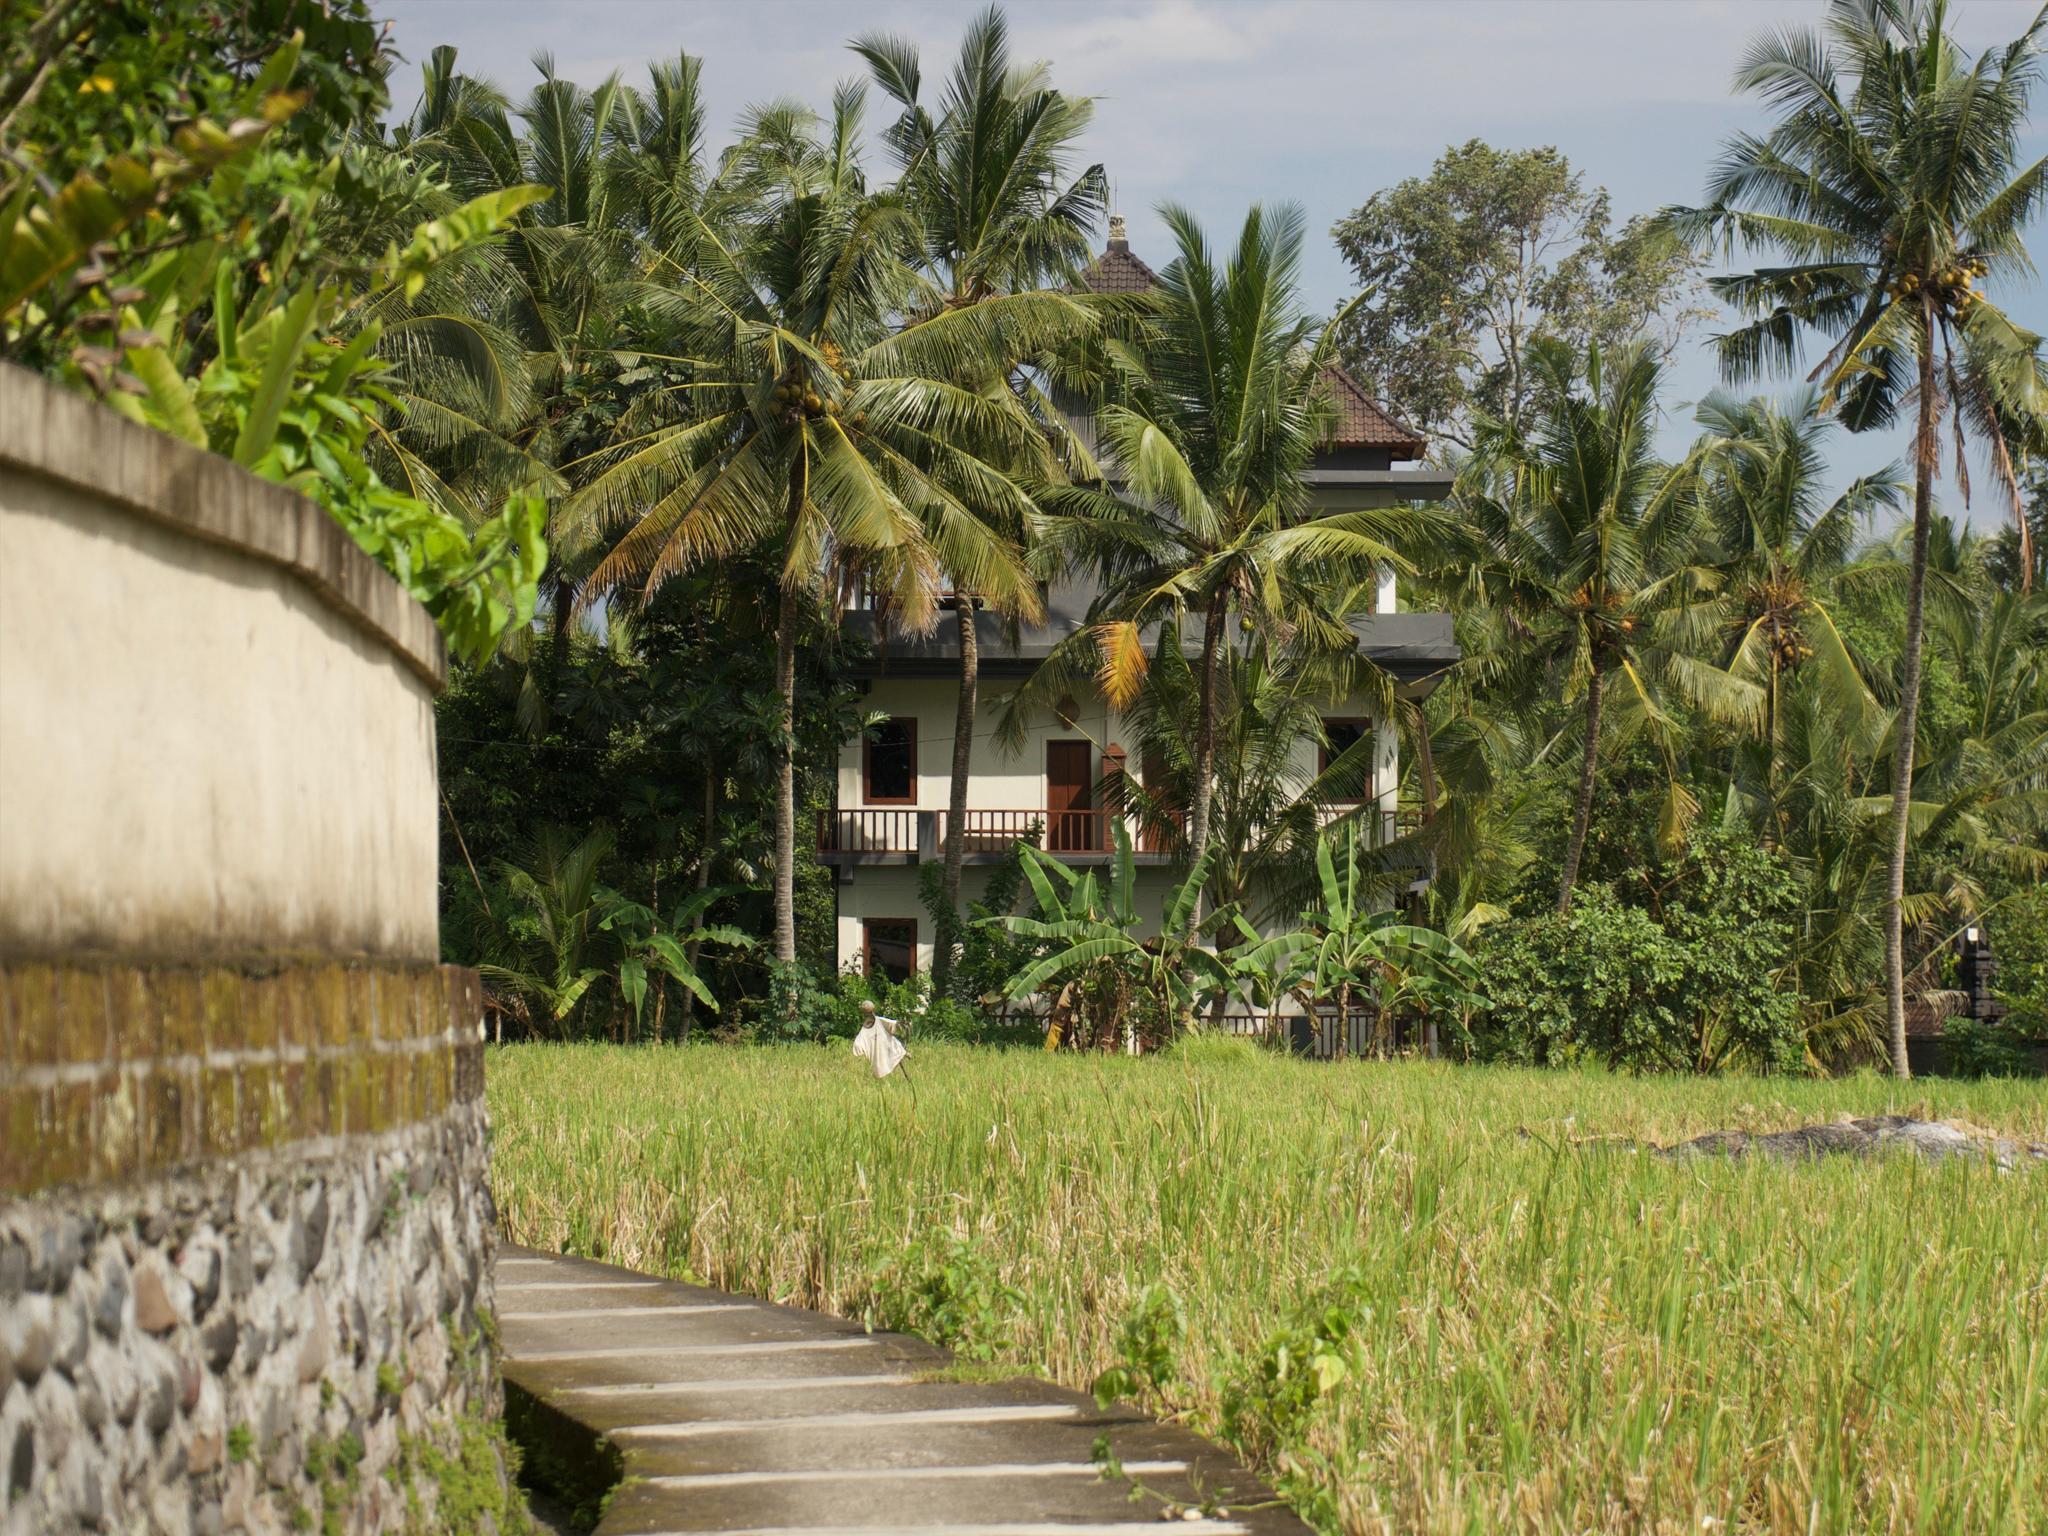 Hotel Eden House Ubud Bali - Jl. Raya Ubud subak sokwayah abangan Ubud Bali  - Bali